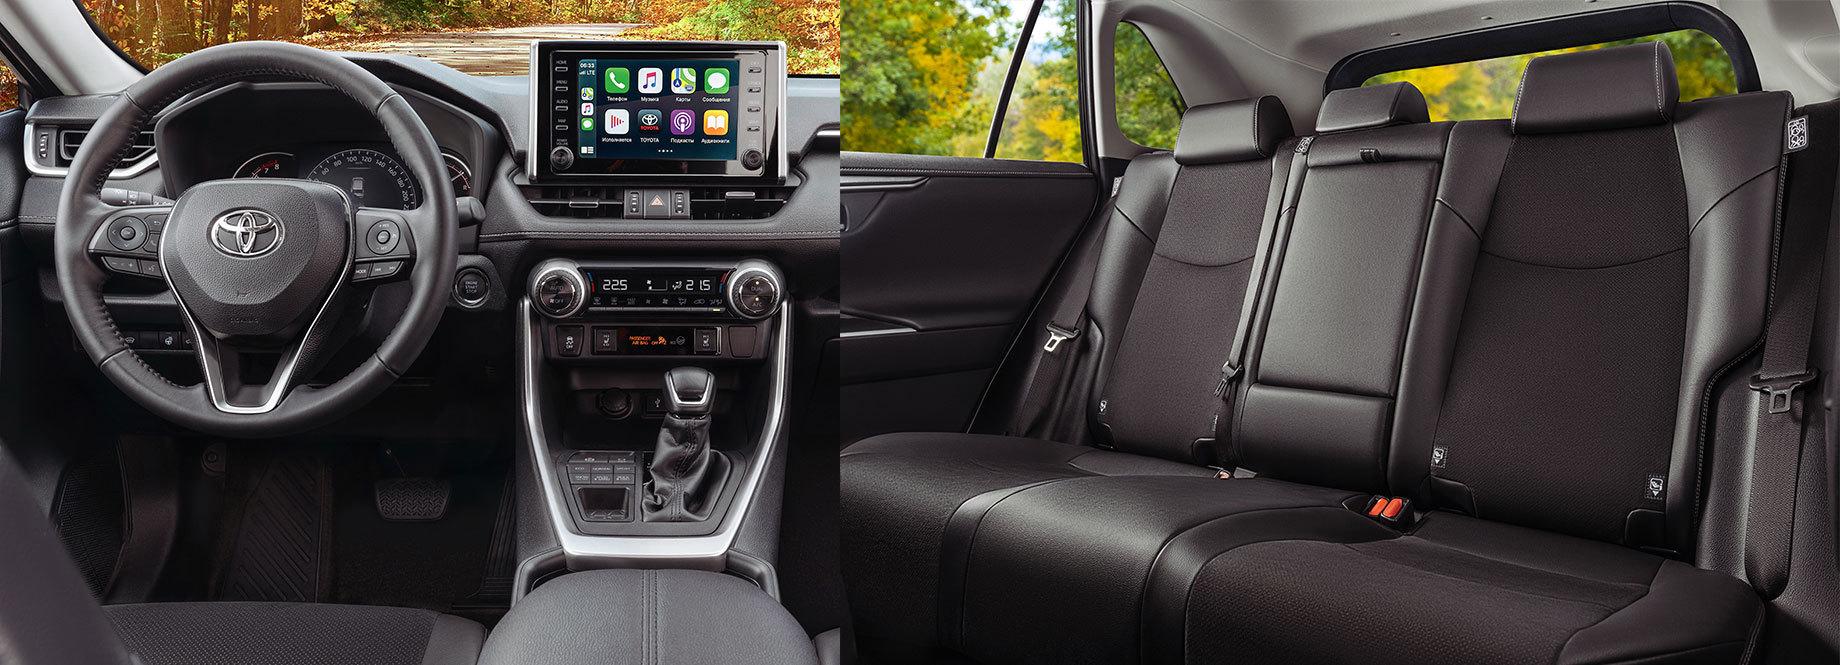 ВРоссии появилась чёрно-белая Toyota RAV4 Style